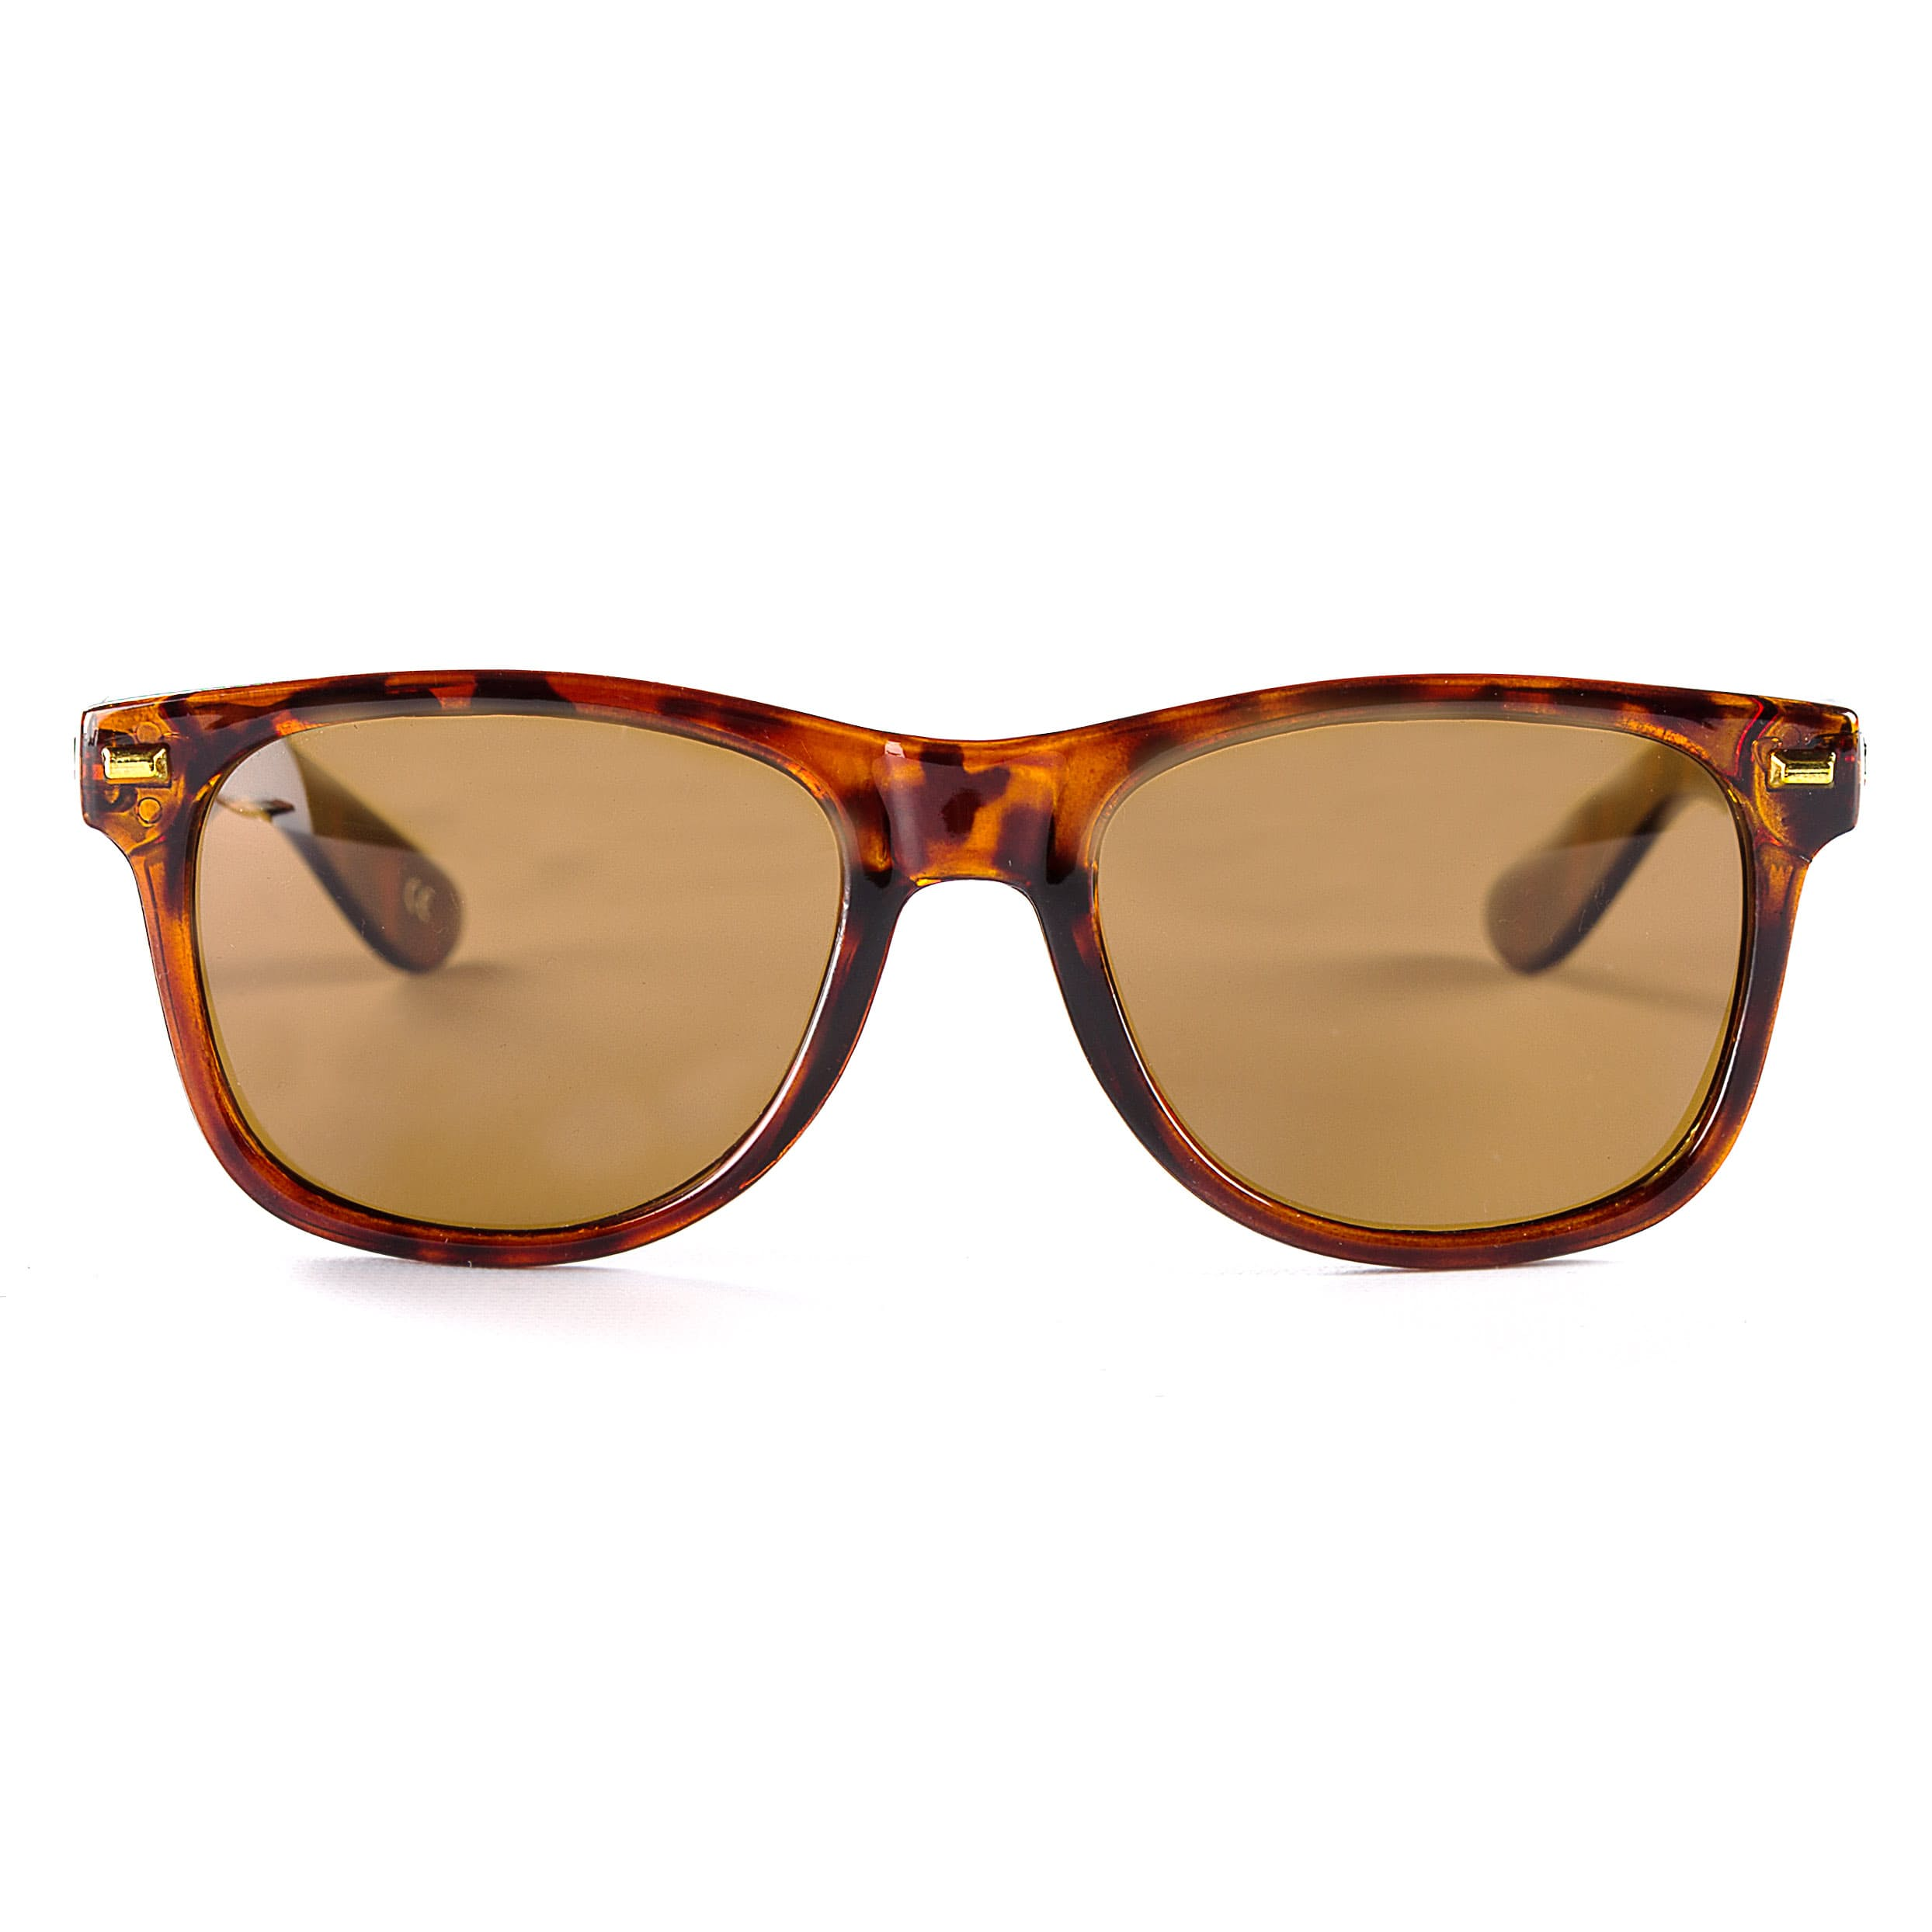 Emvnxitx1d knockaround fort knocks polarized sunglasses 0 original